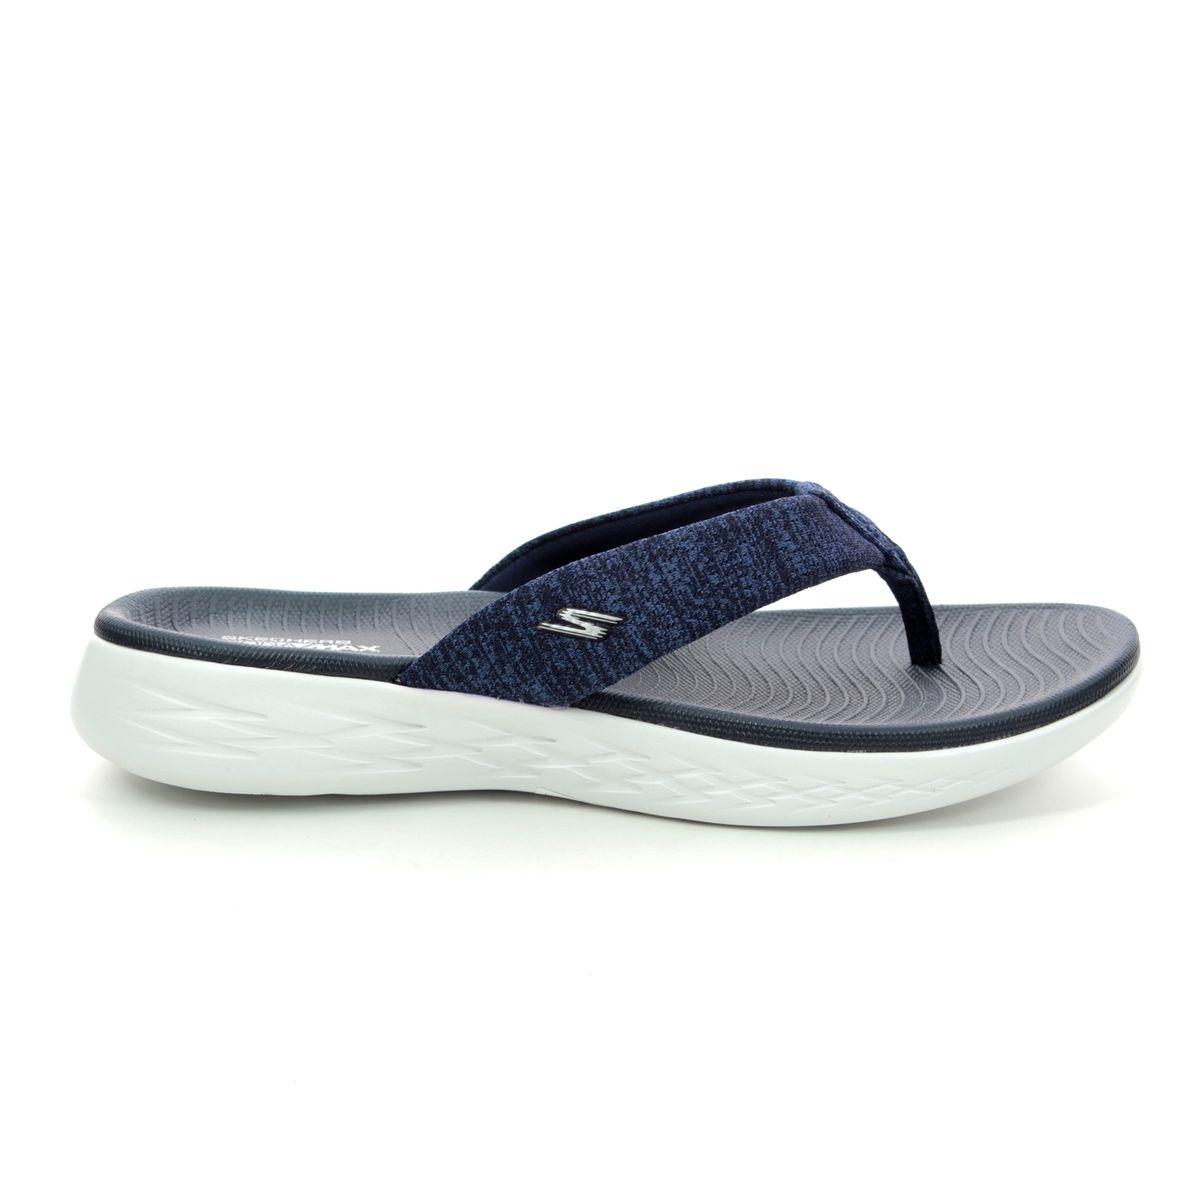 Skechers Preferred 15304 NVW Navy Toe